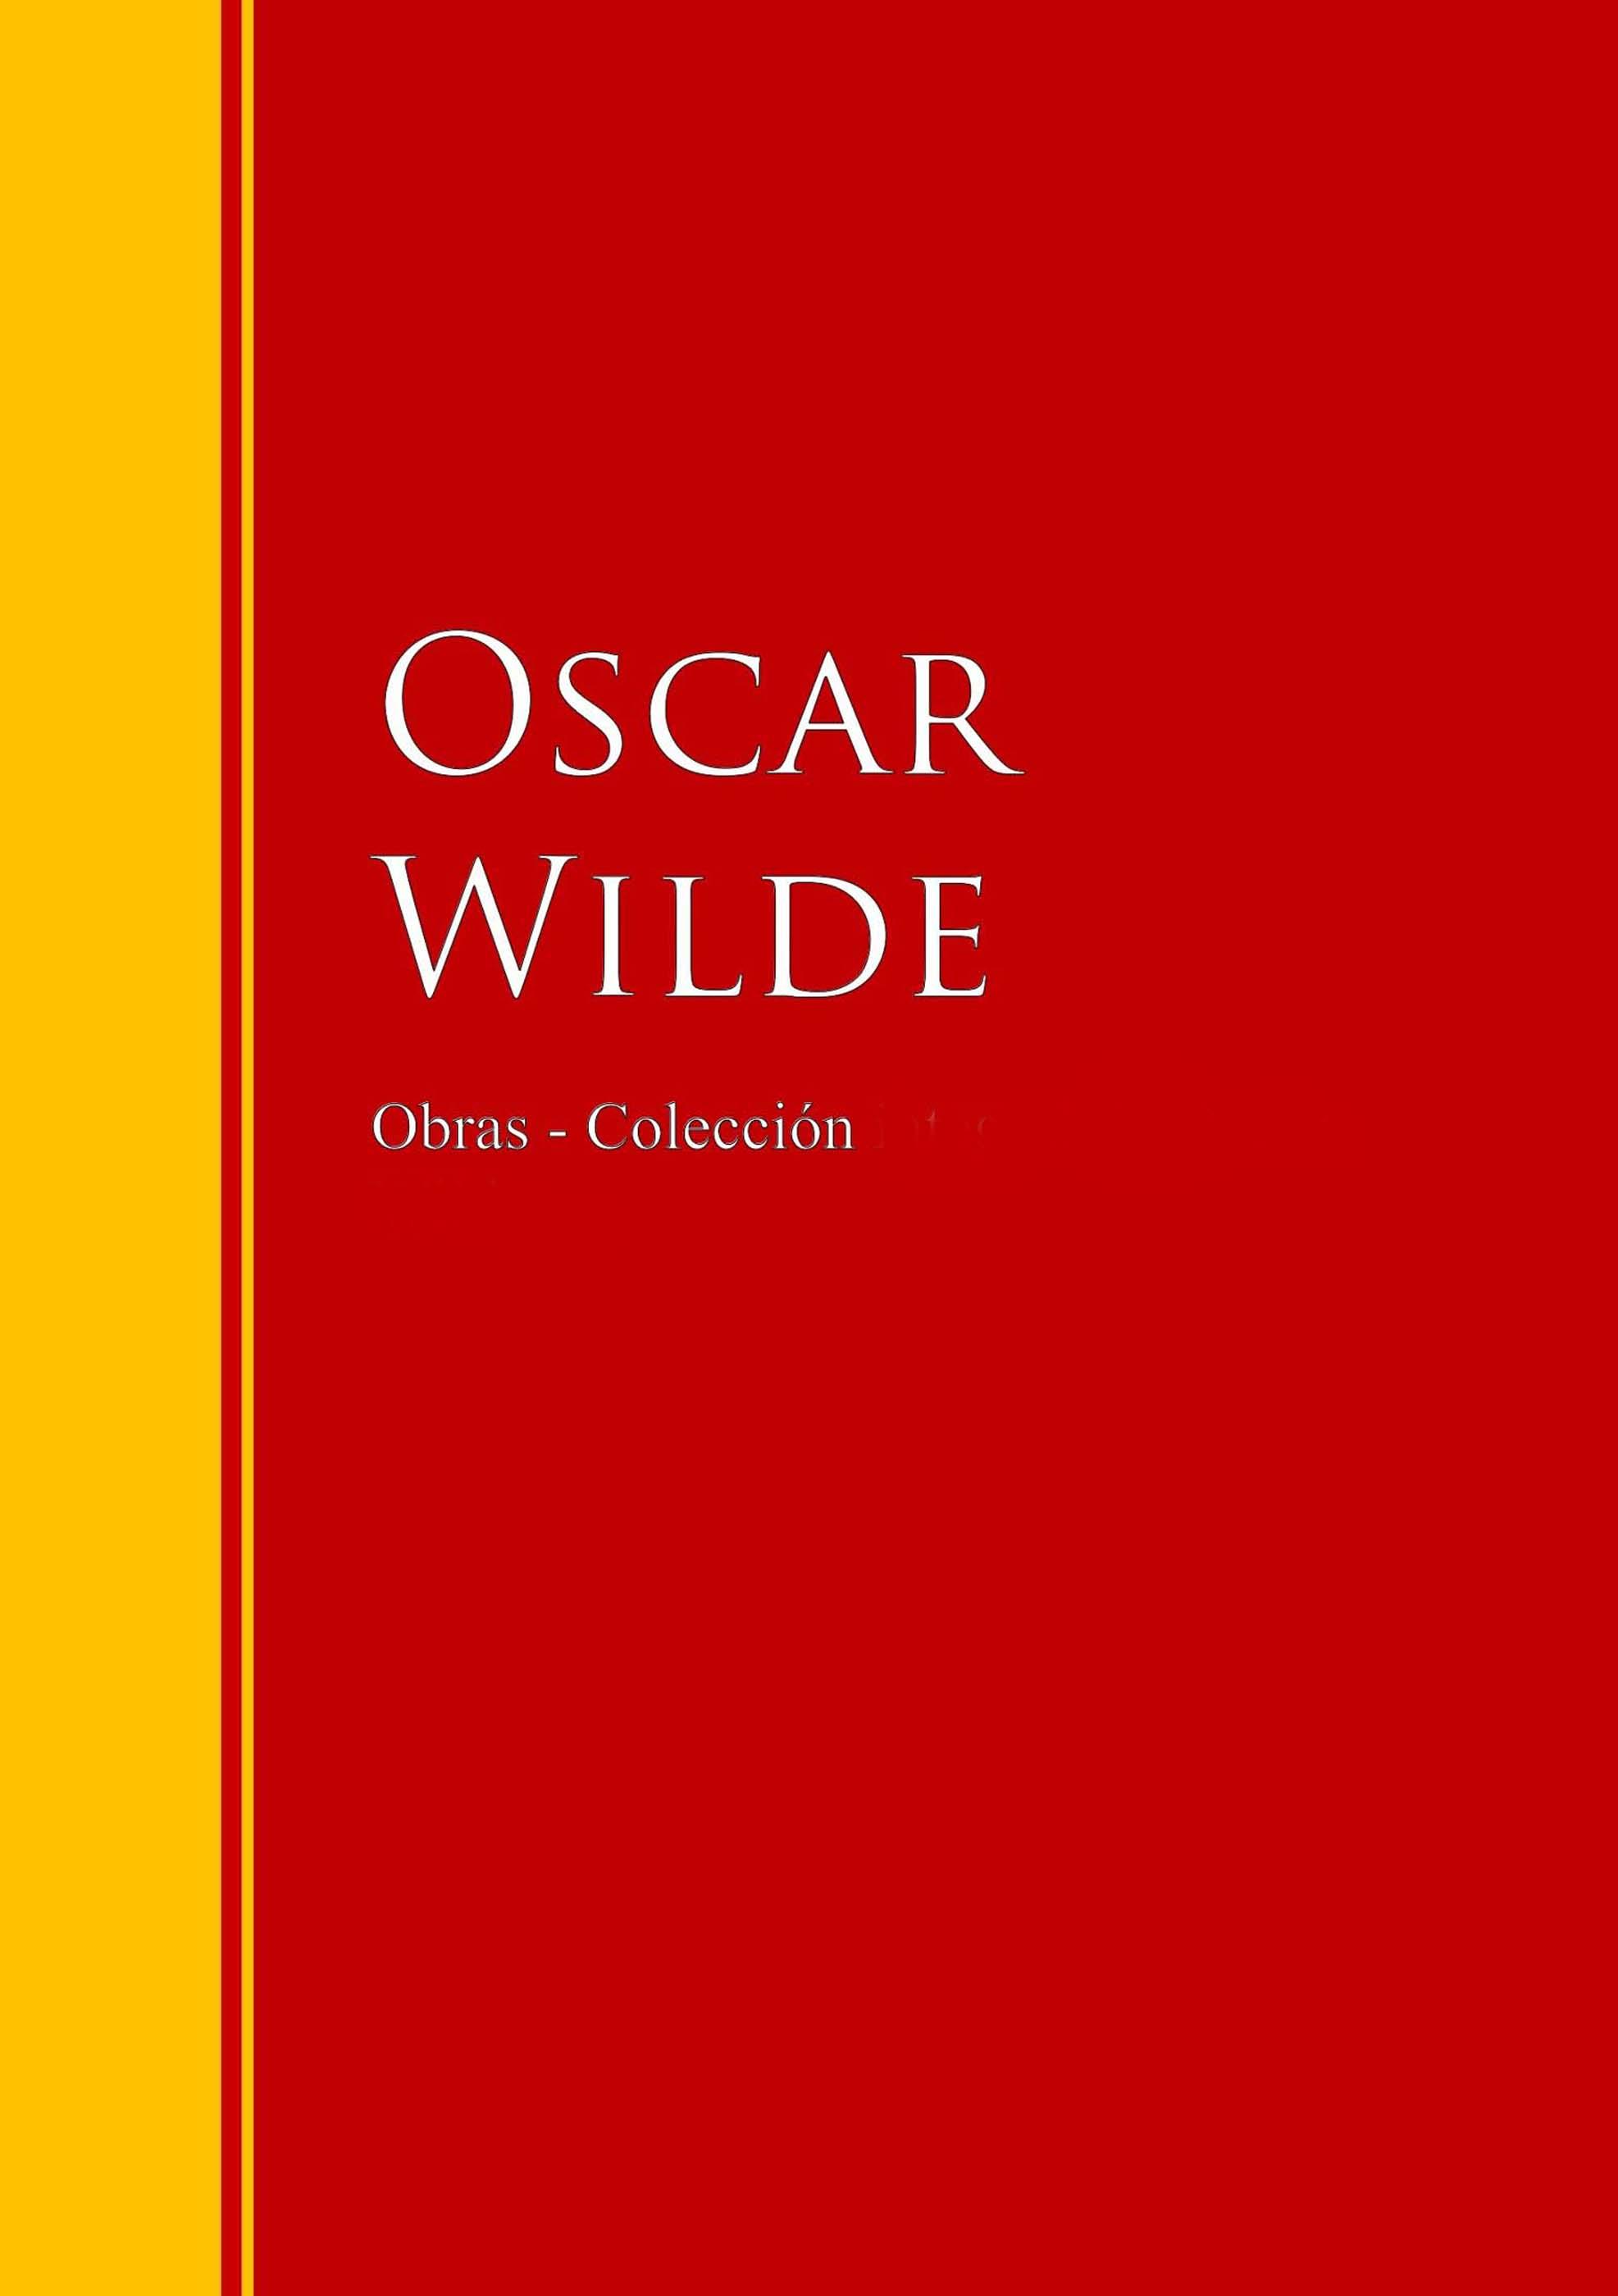 Oscar Wilde Las Obras de Oscar Wilde